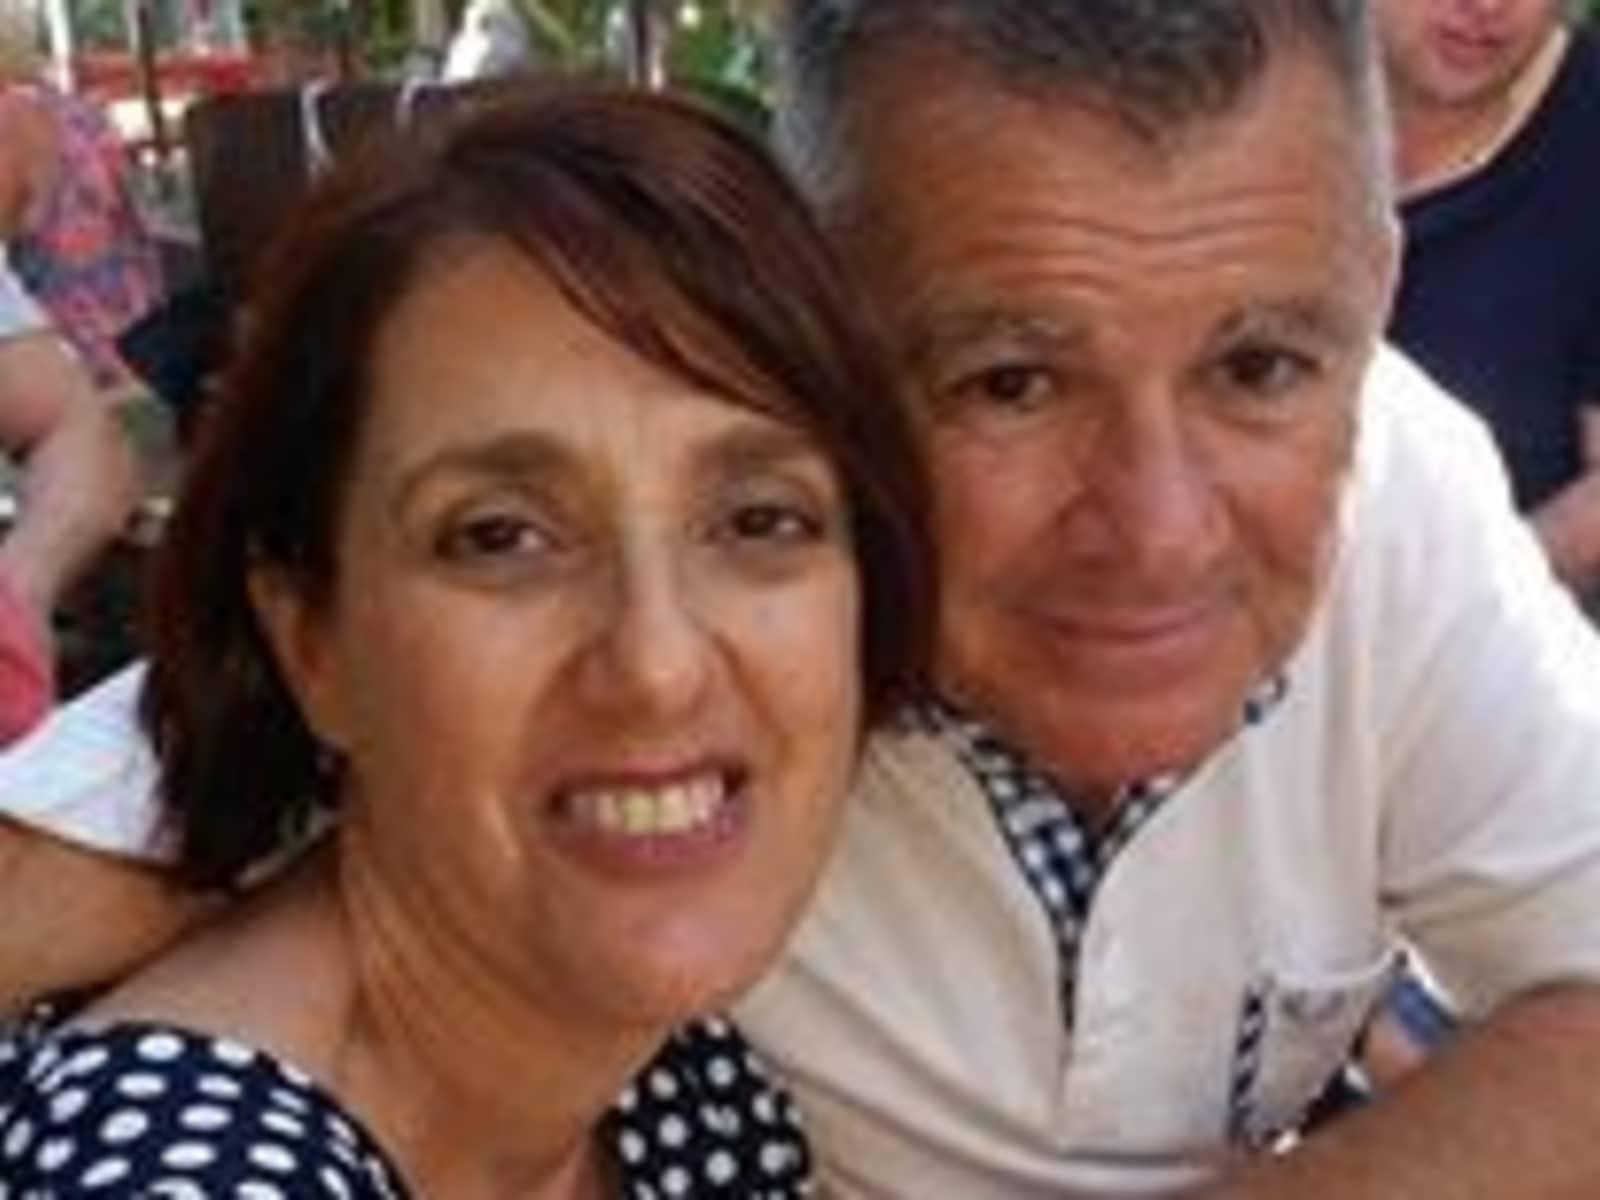 James & Lynette from Perth, Western Australia, Australia